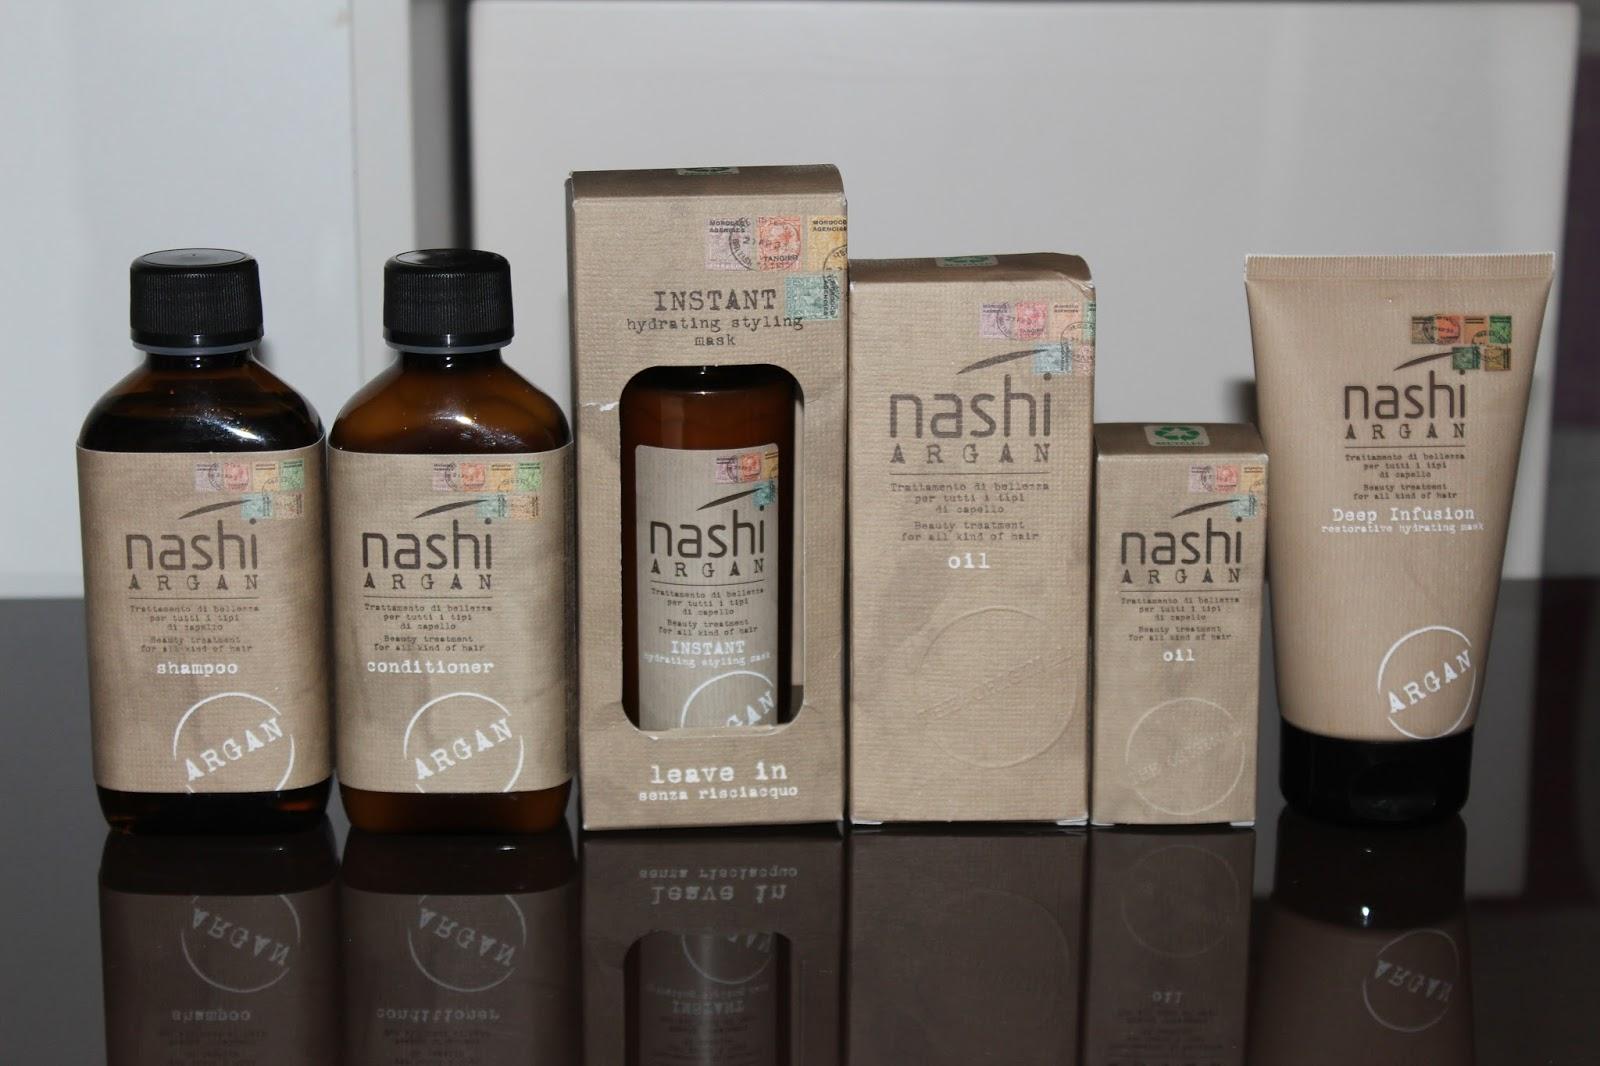 Nashi Argan grupna recenzija proizvoda za kosu